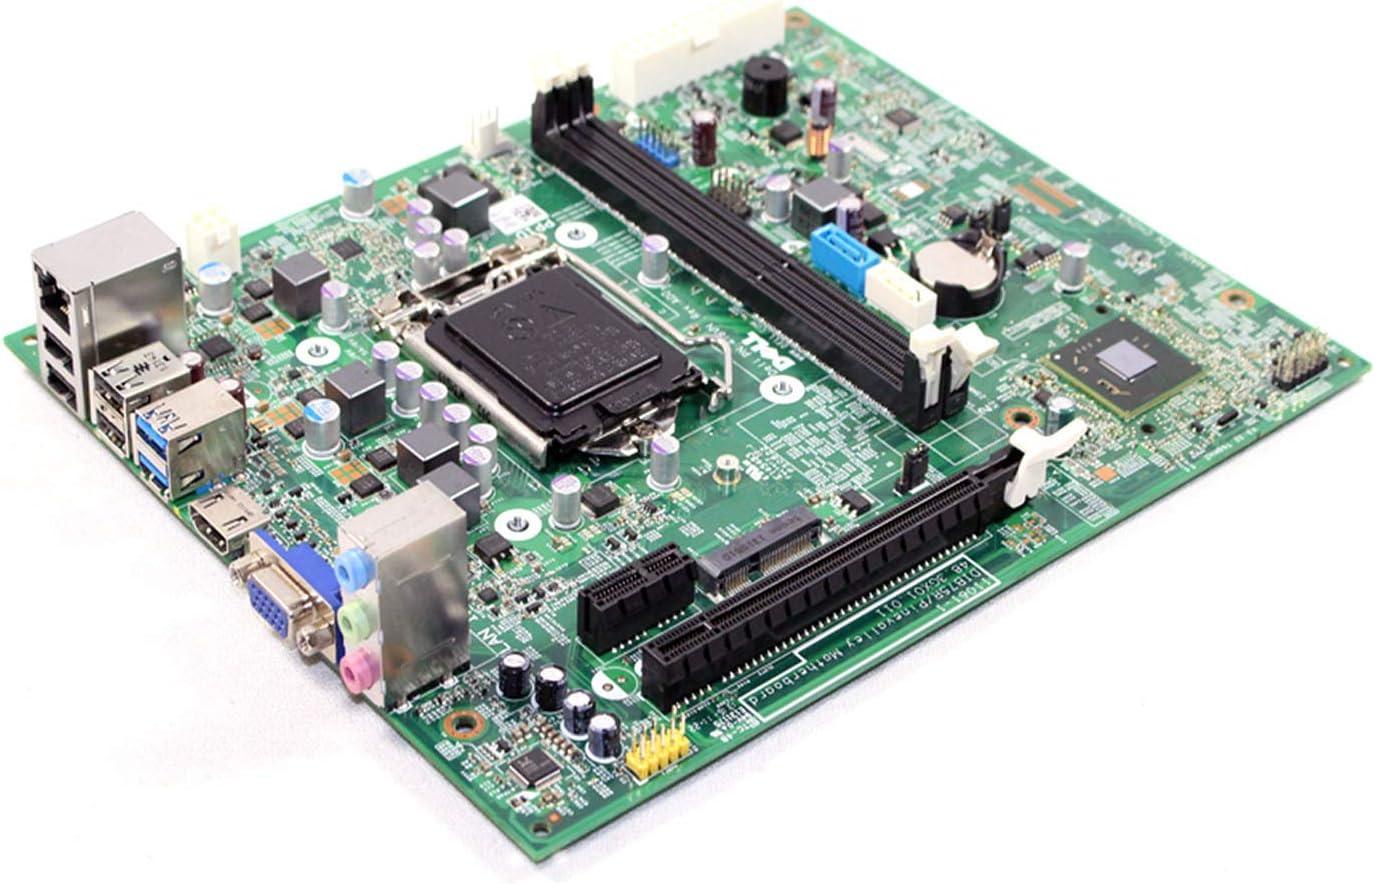 XFWHV Dell Inspiron 660 Vostro 270 270s Intel Desktop Motherboard s1156